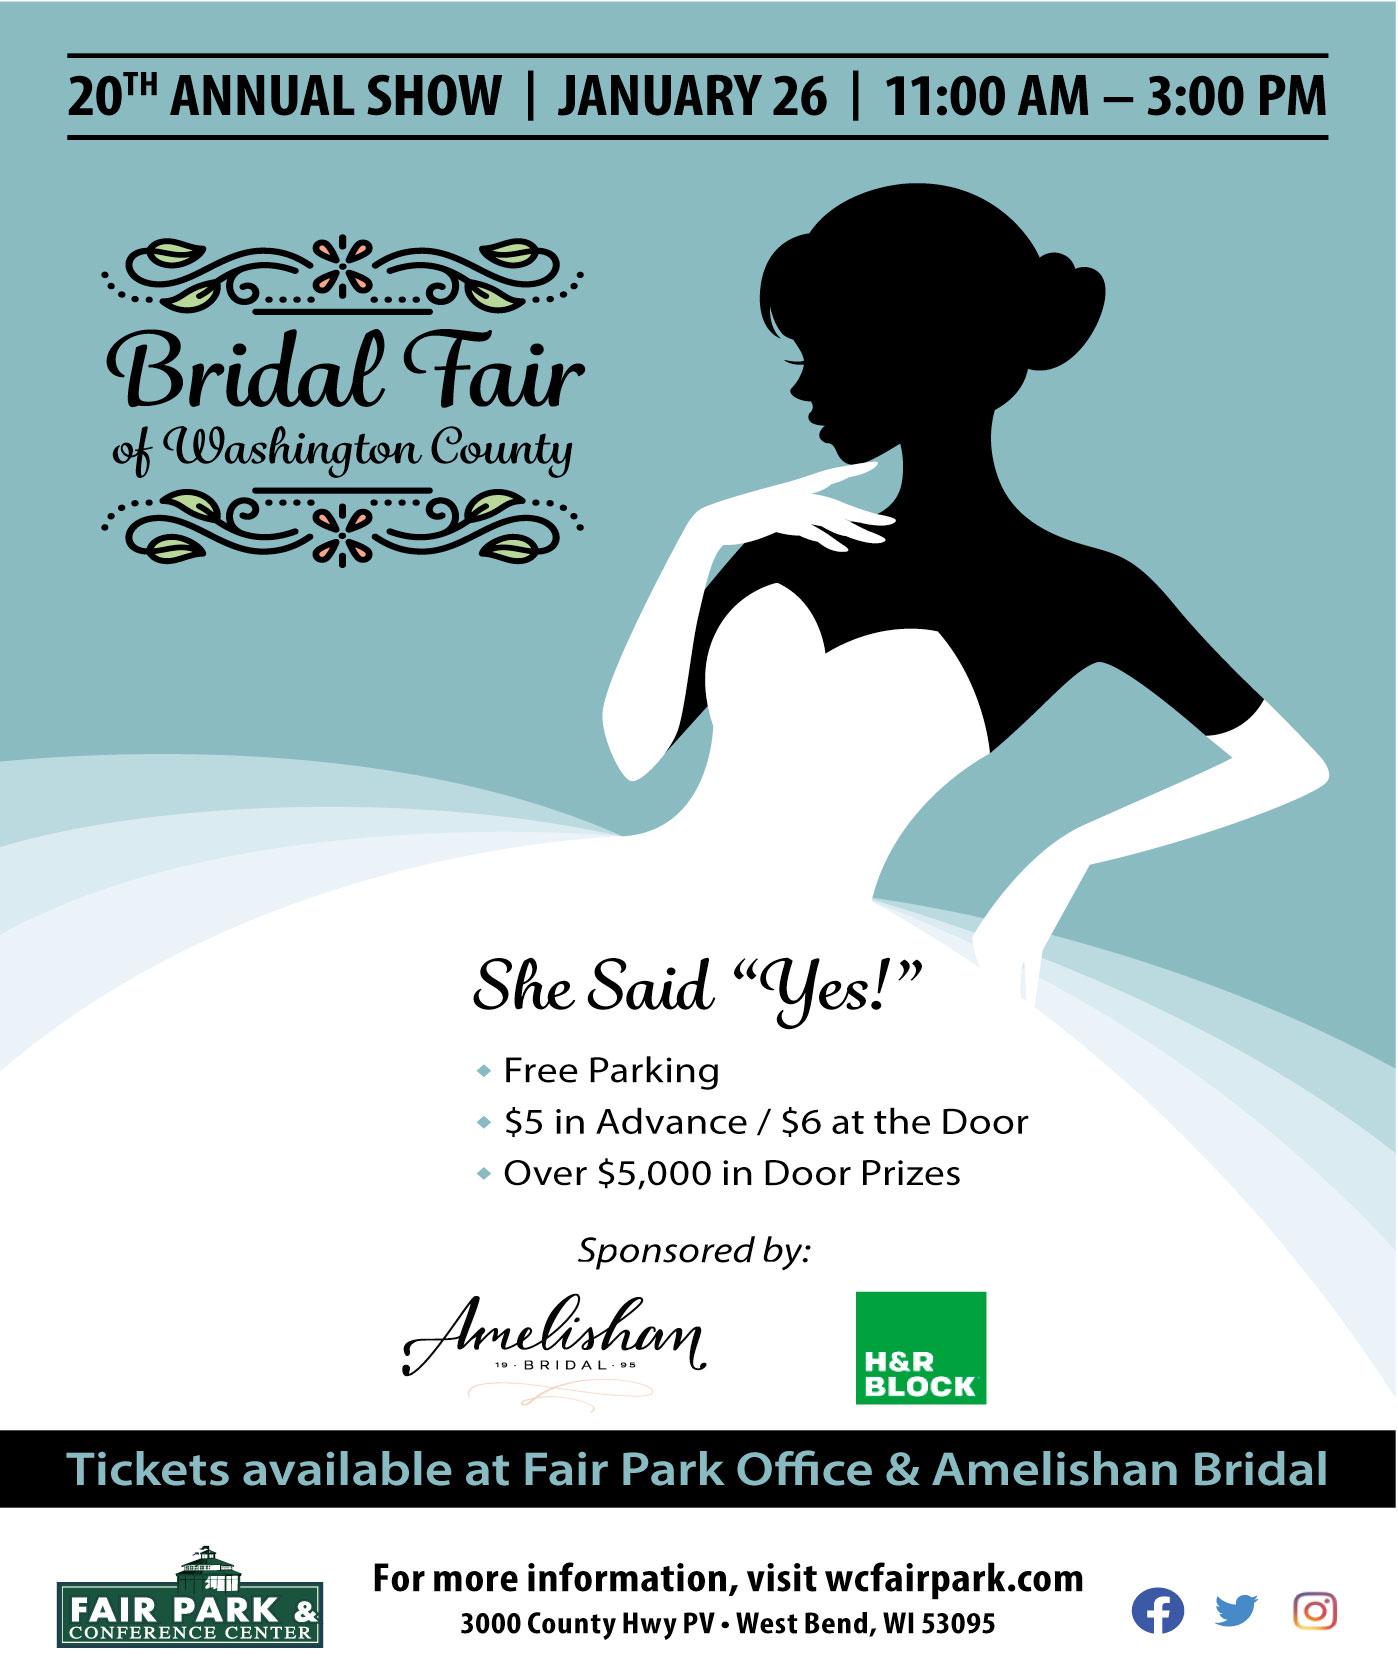 Washington County Bridal Fair